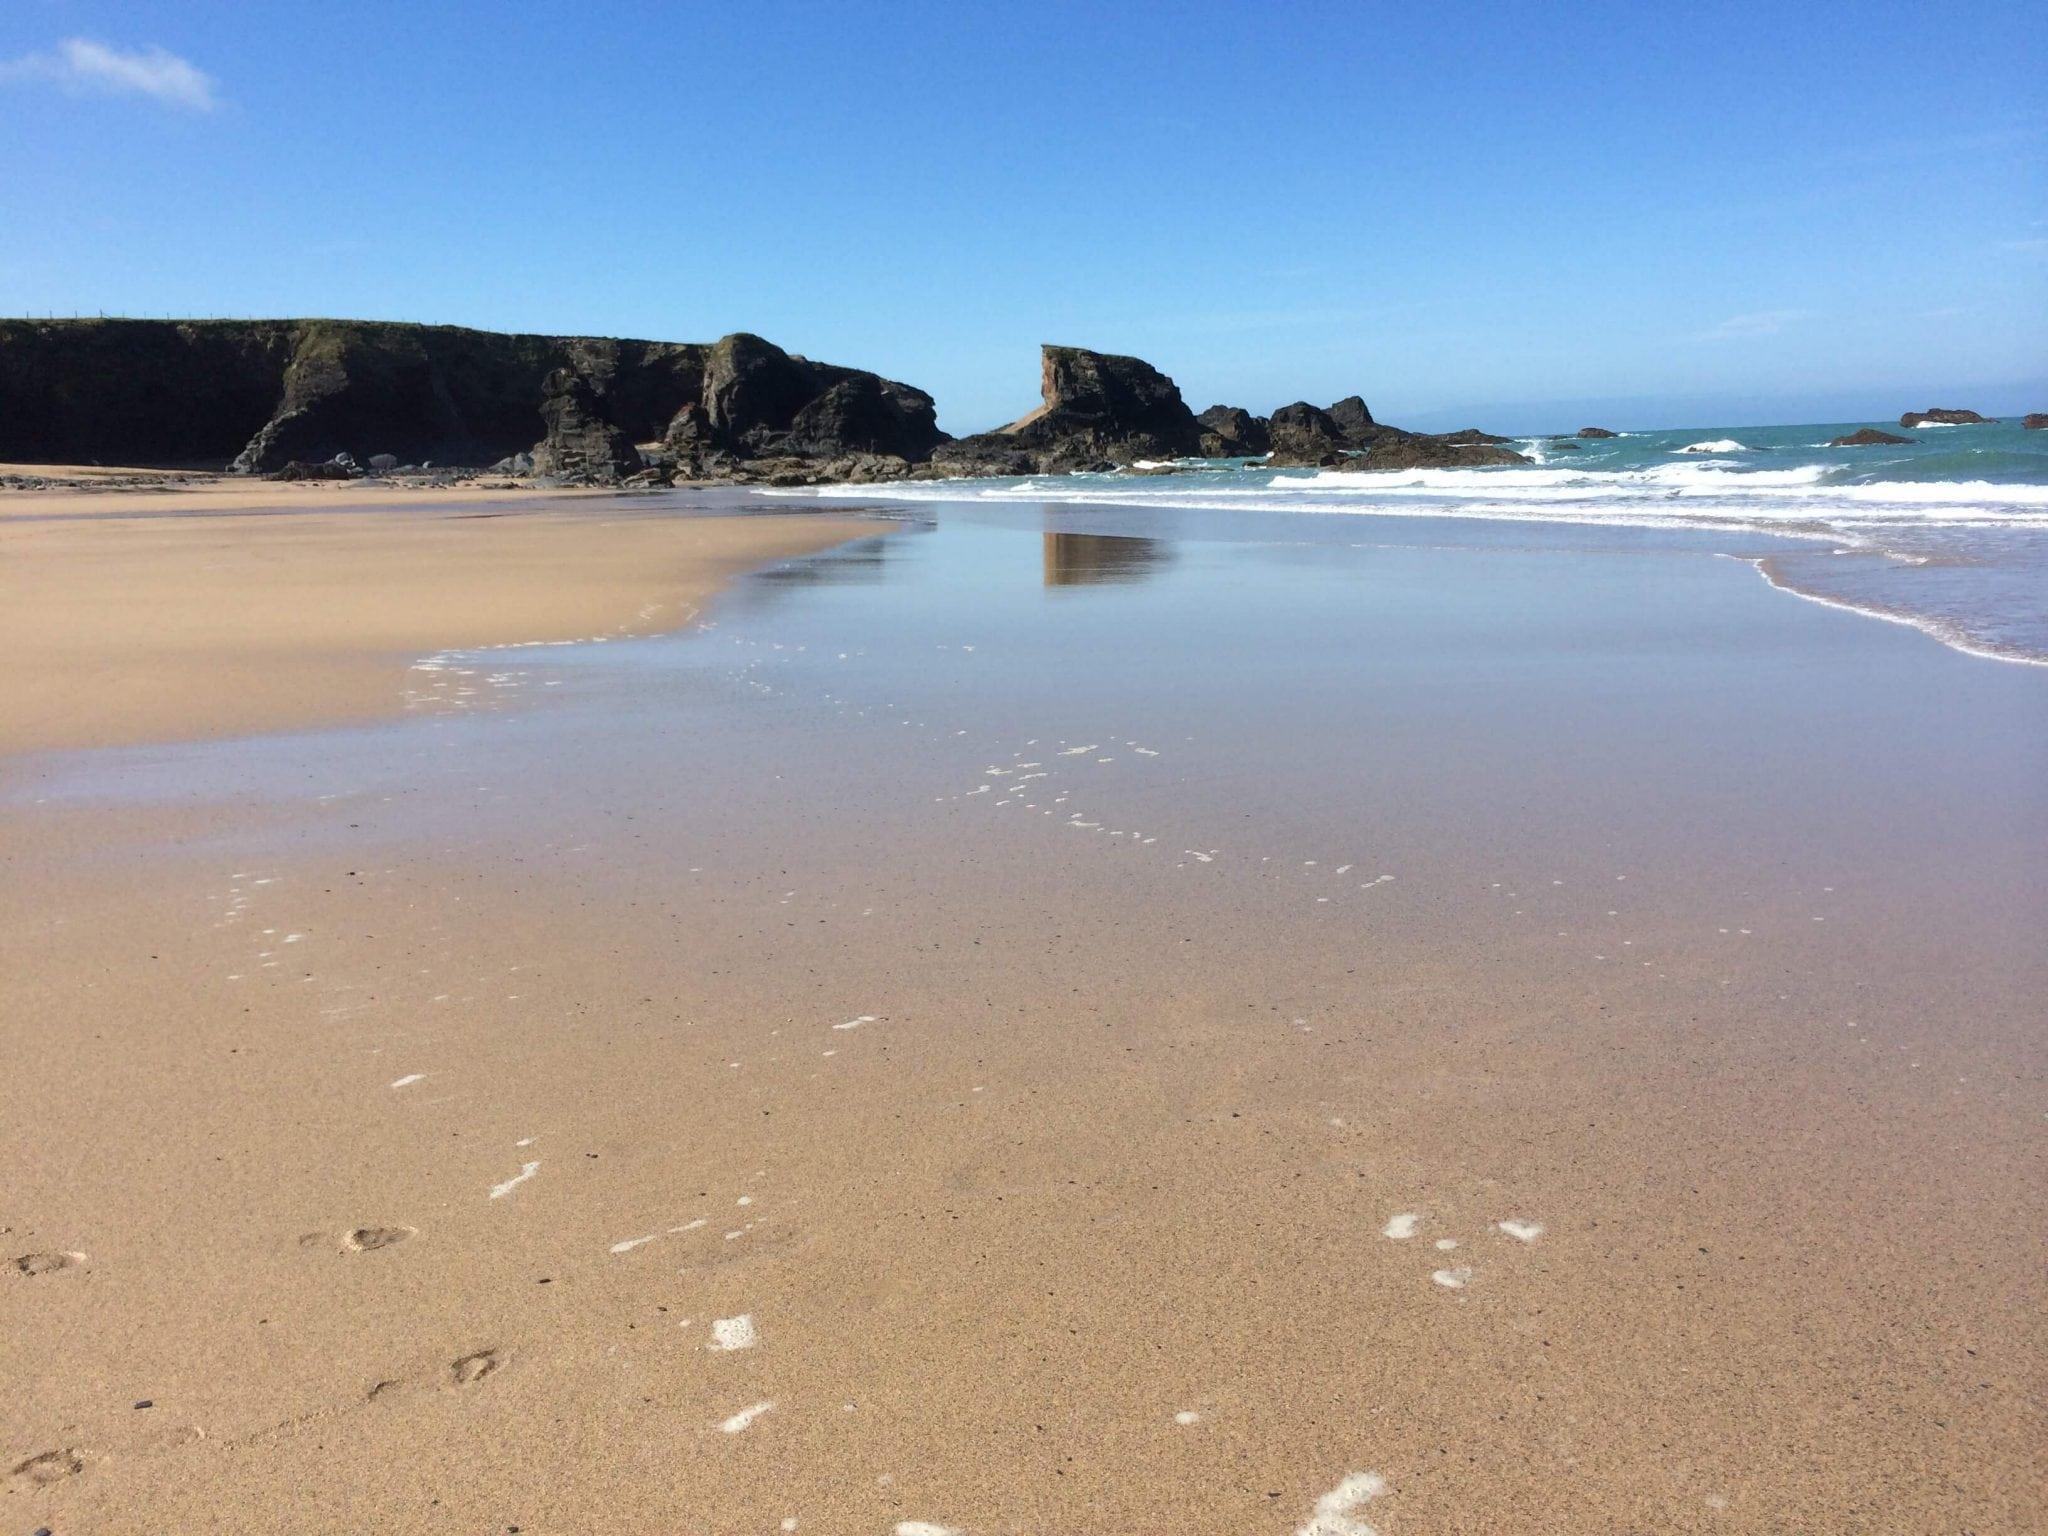 The Beach - from beach